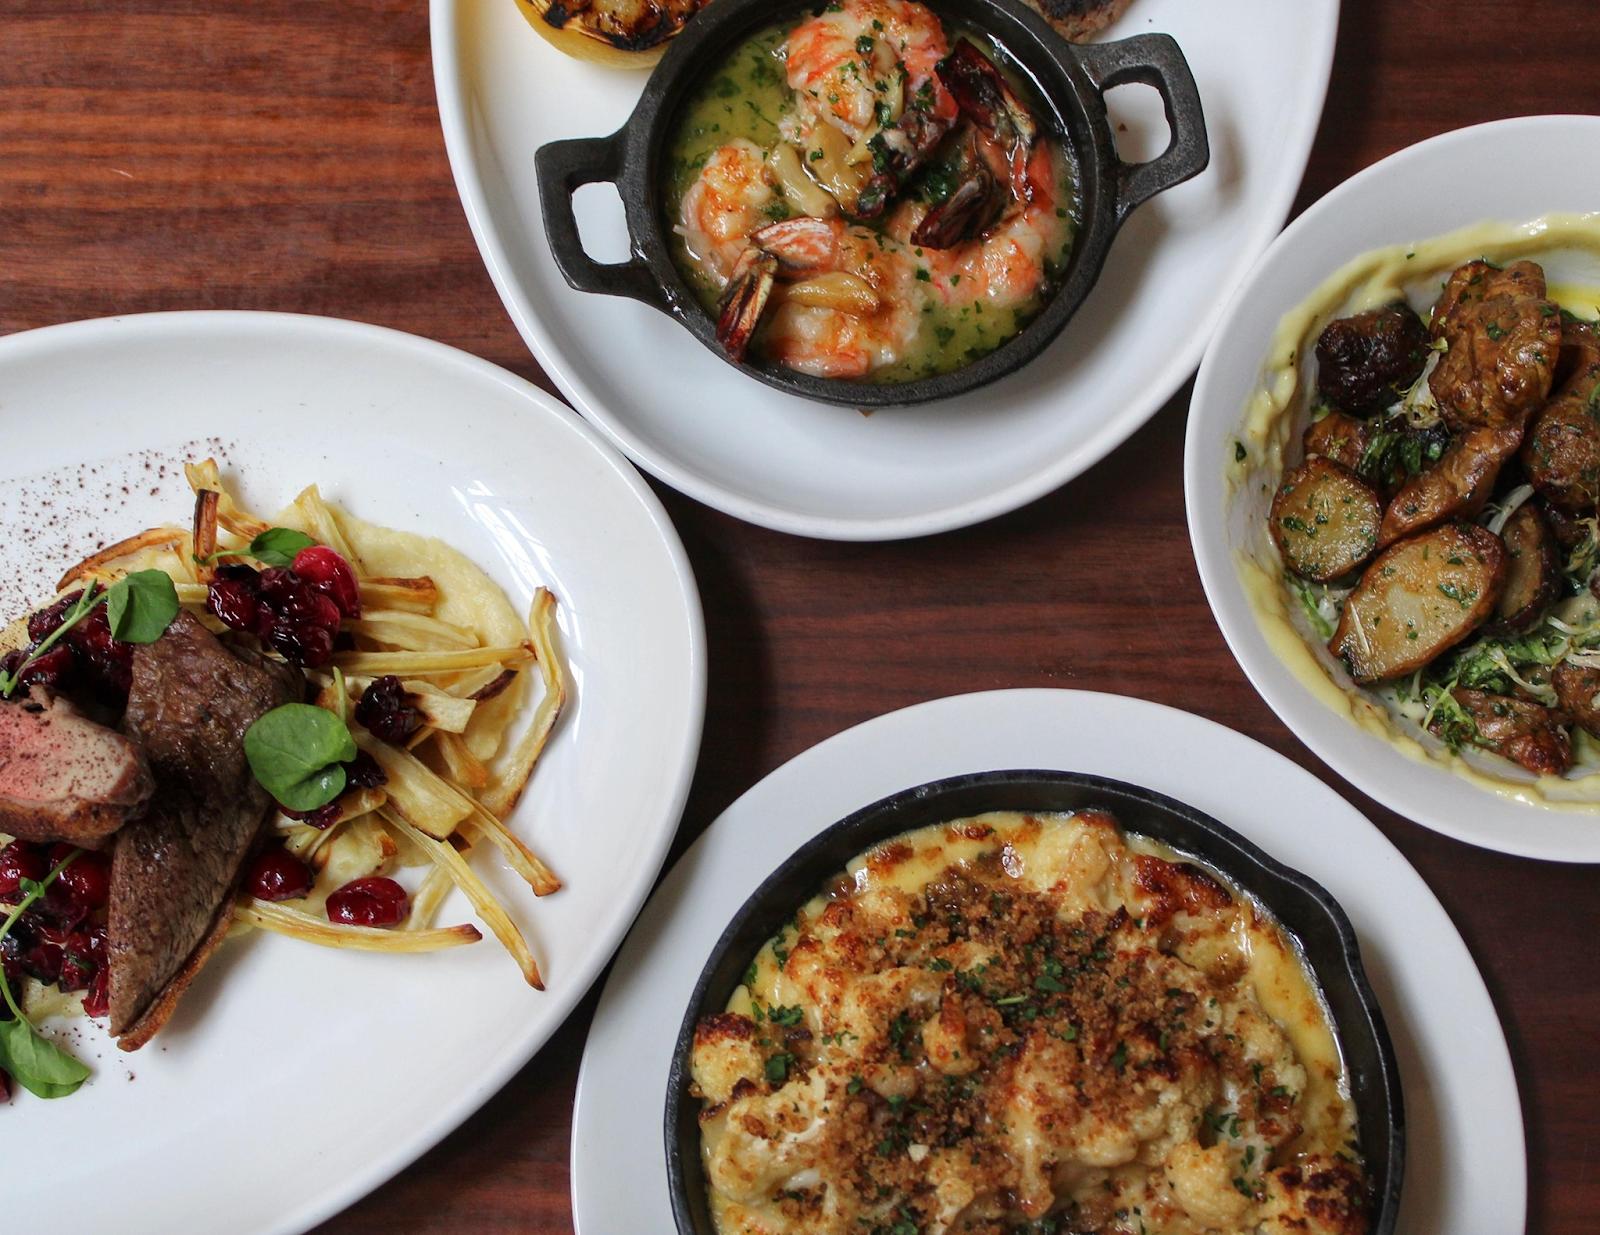 Three plates of dinner one shrimp, one steak, one has potatoes